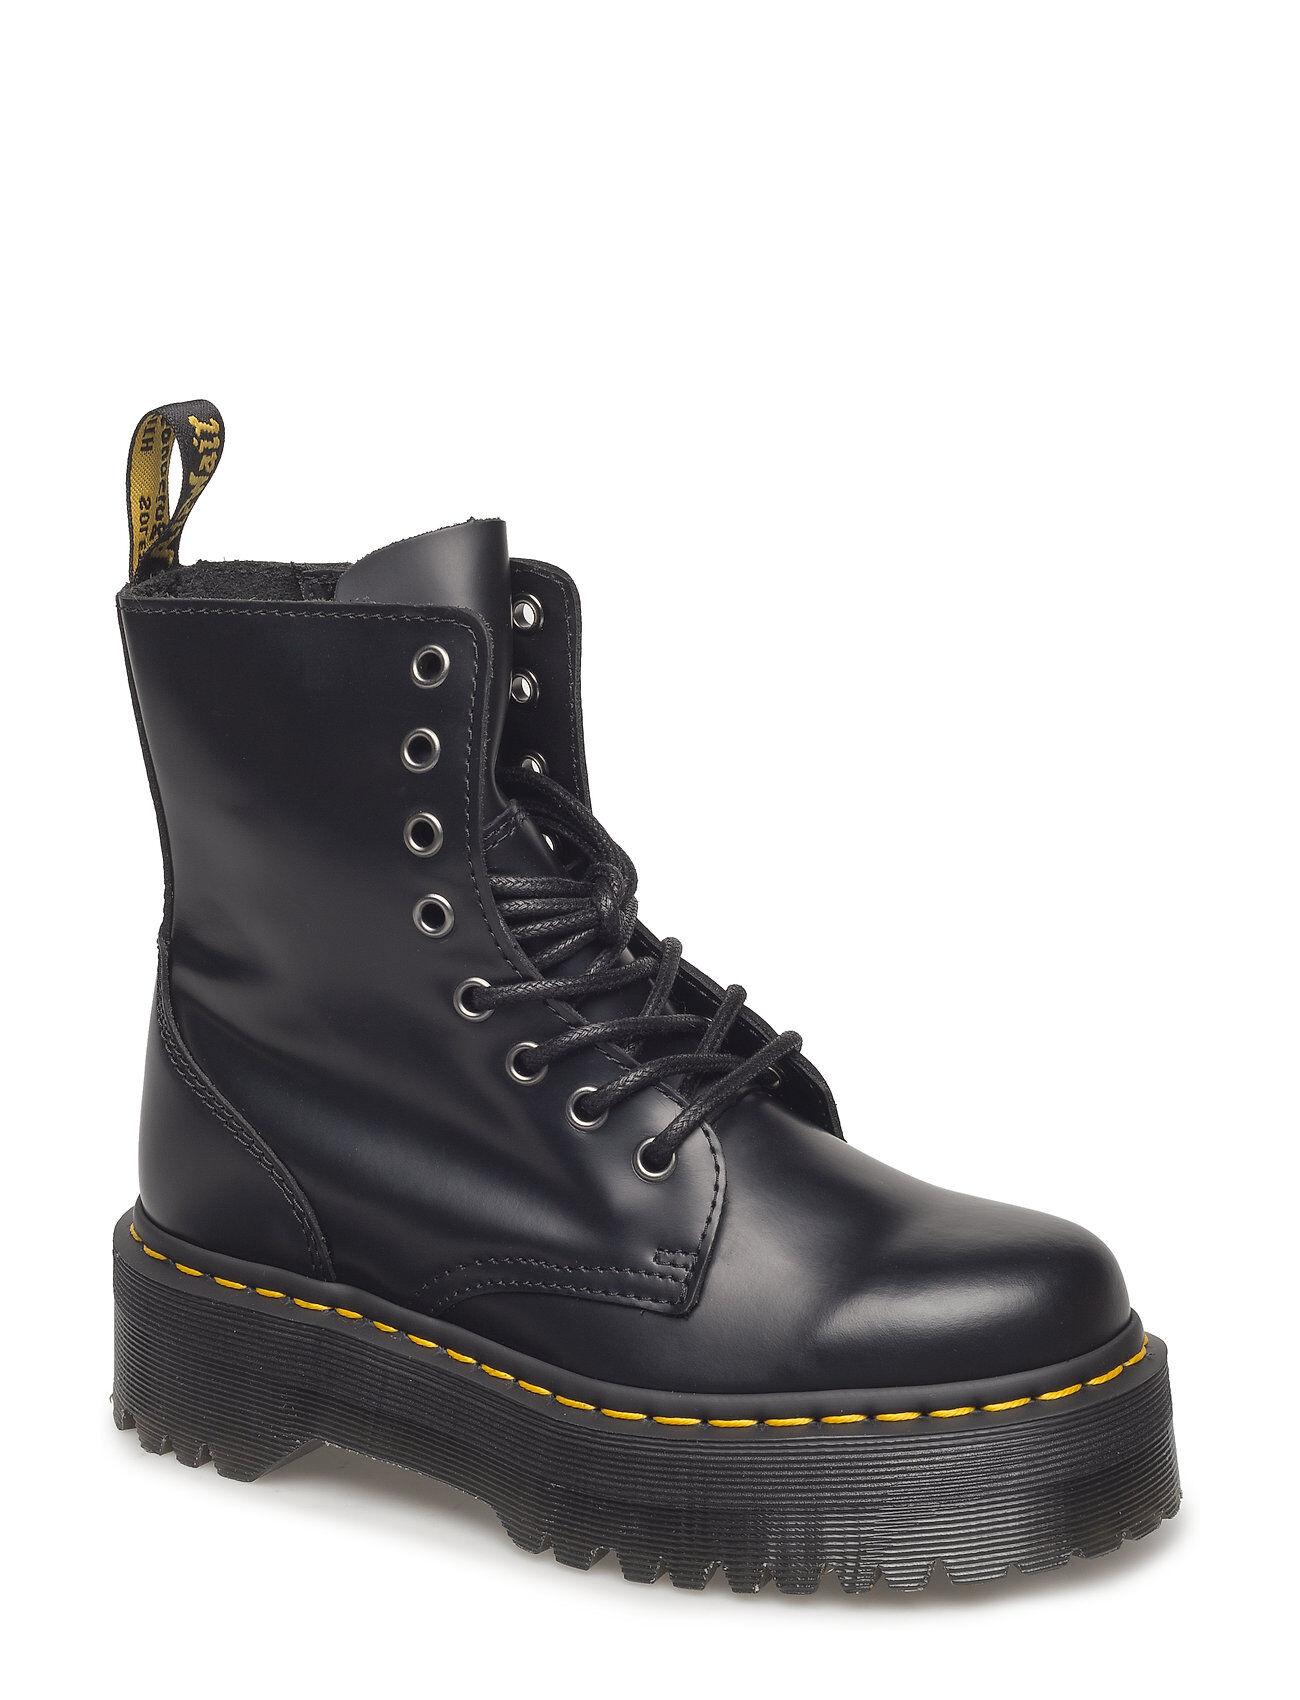 Image of Dr. Martens Jadon Shoes Boots Ankle Boots Ankle Boots Flat Heel Musta Dr. Martens